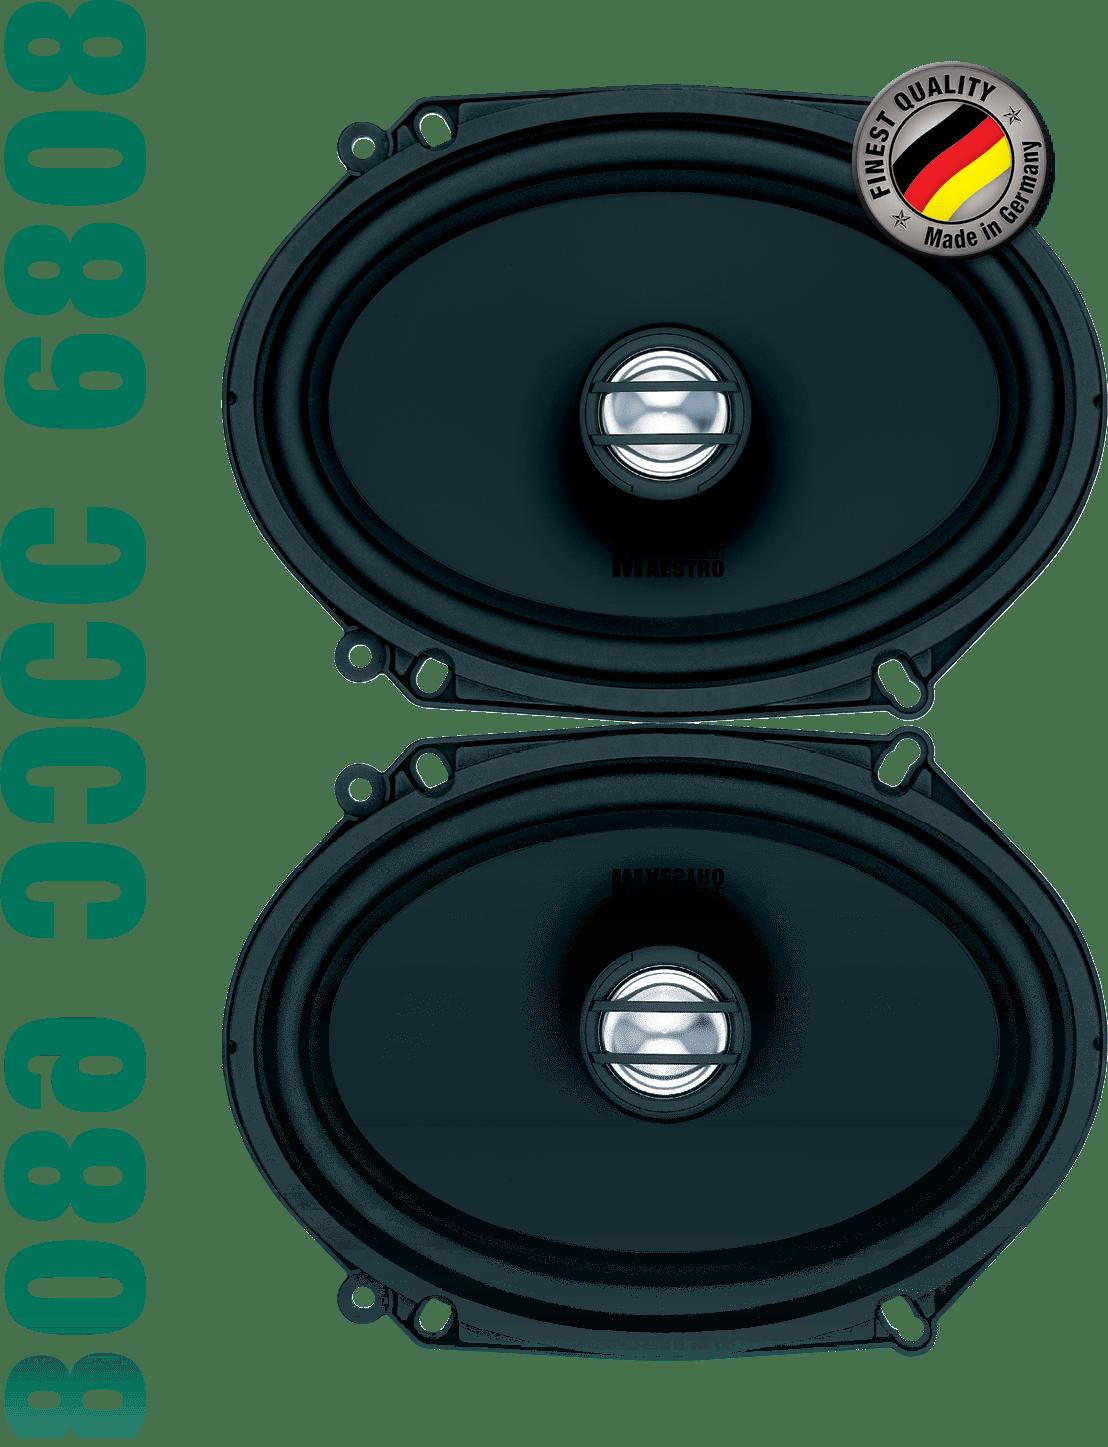 CC 6808 Image